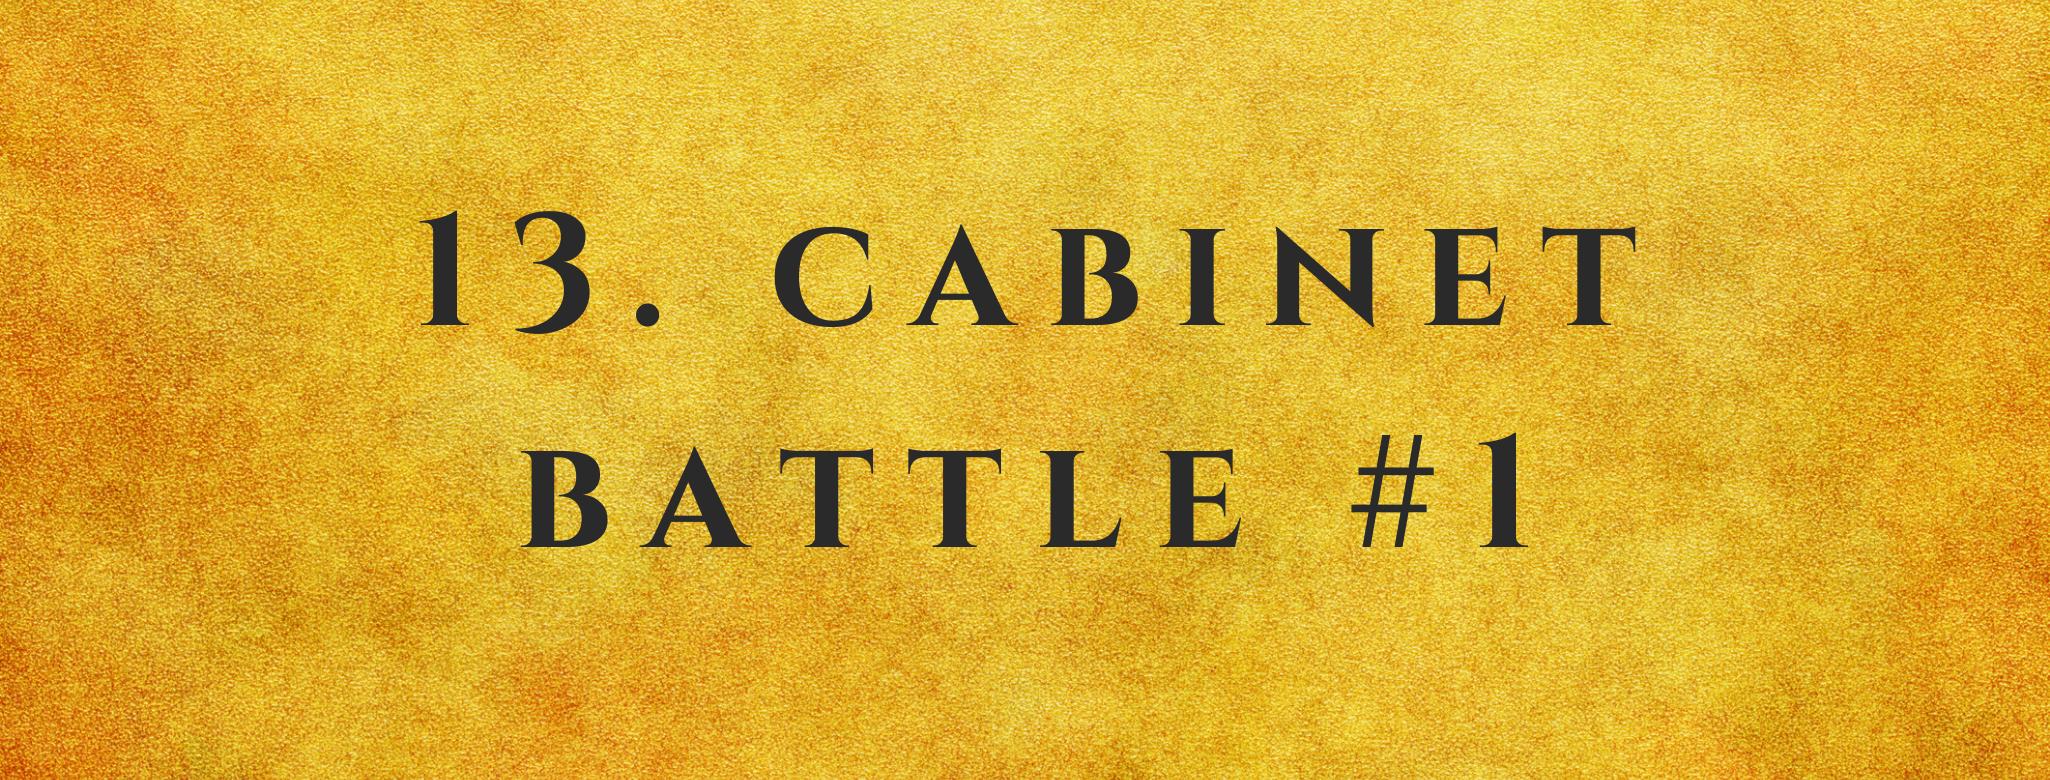 #13 Cabinet Battle #1